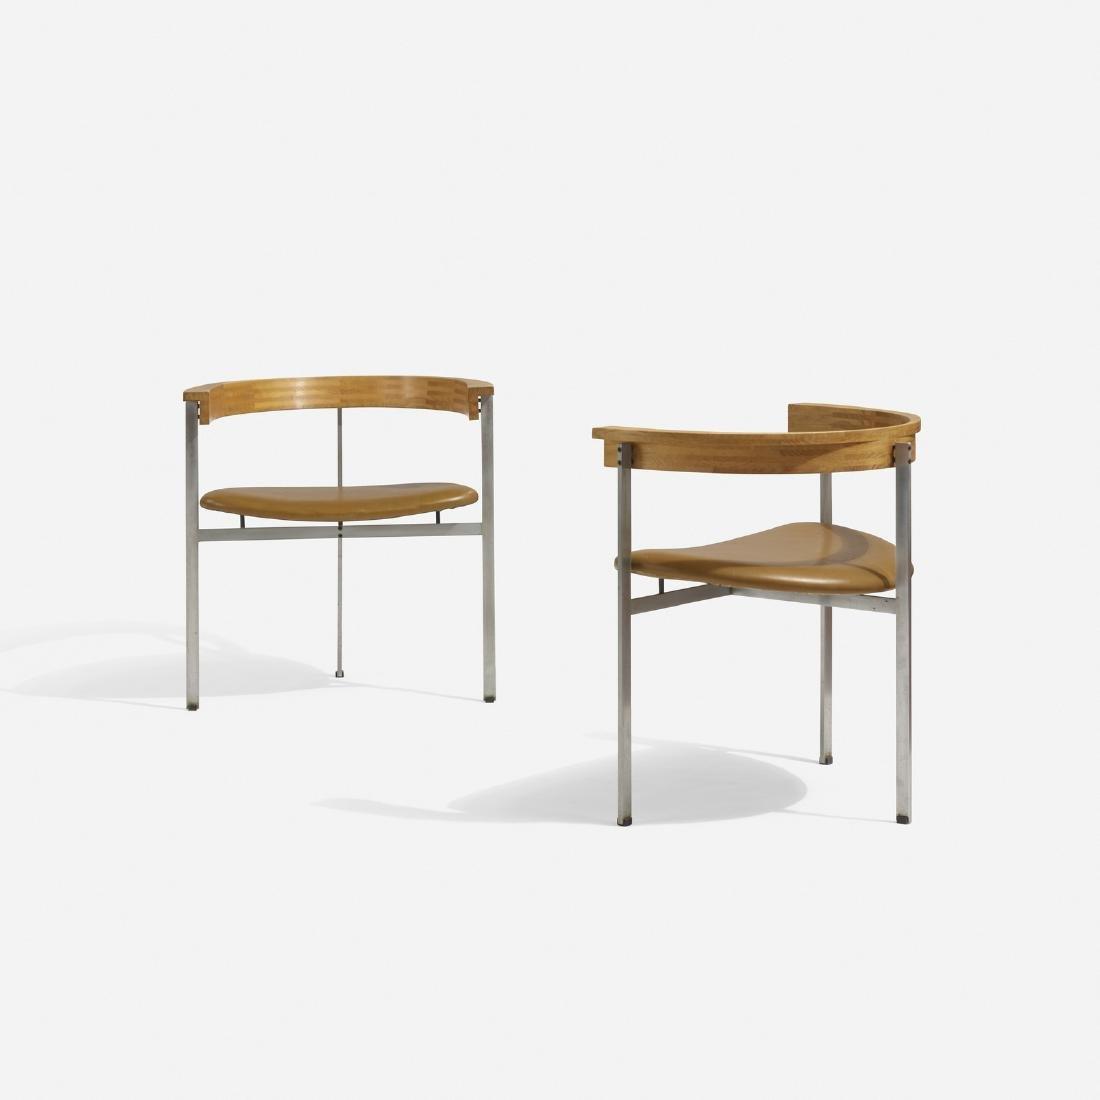 Poul Kjaerholm, PK 11 chairs, pair